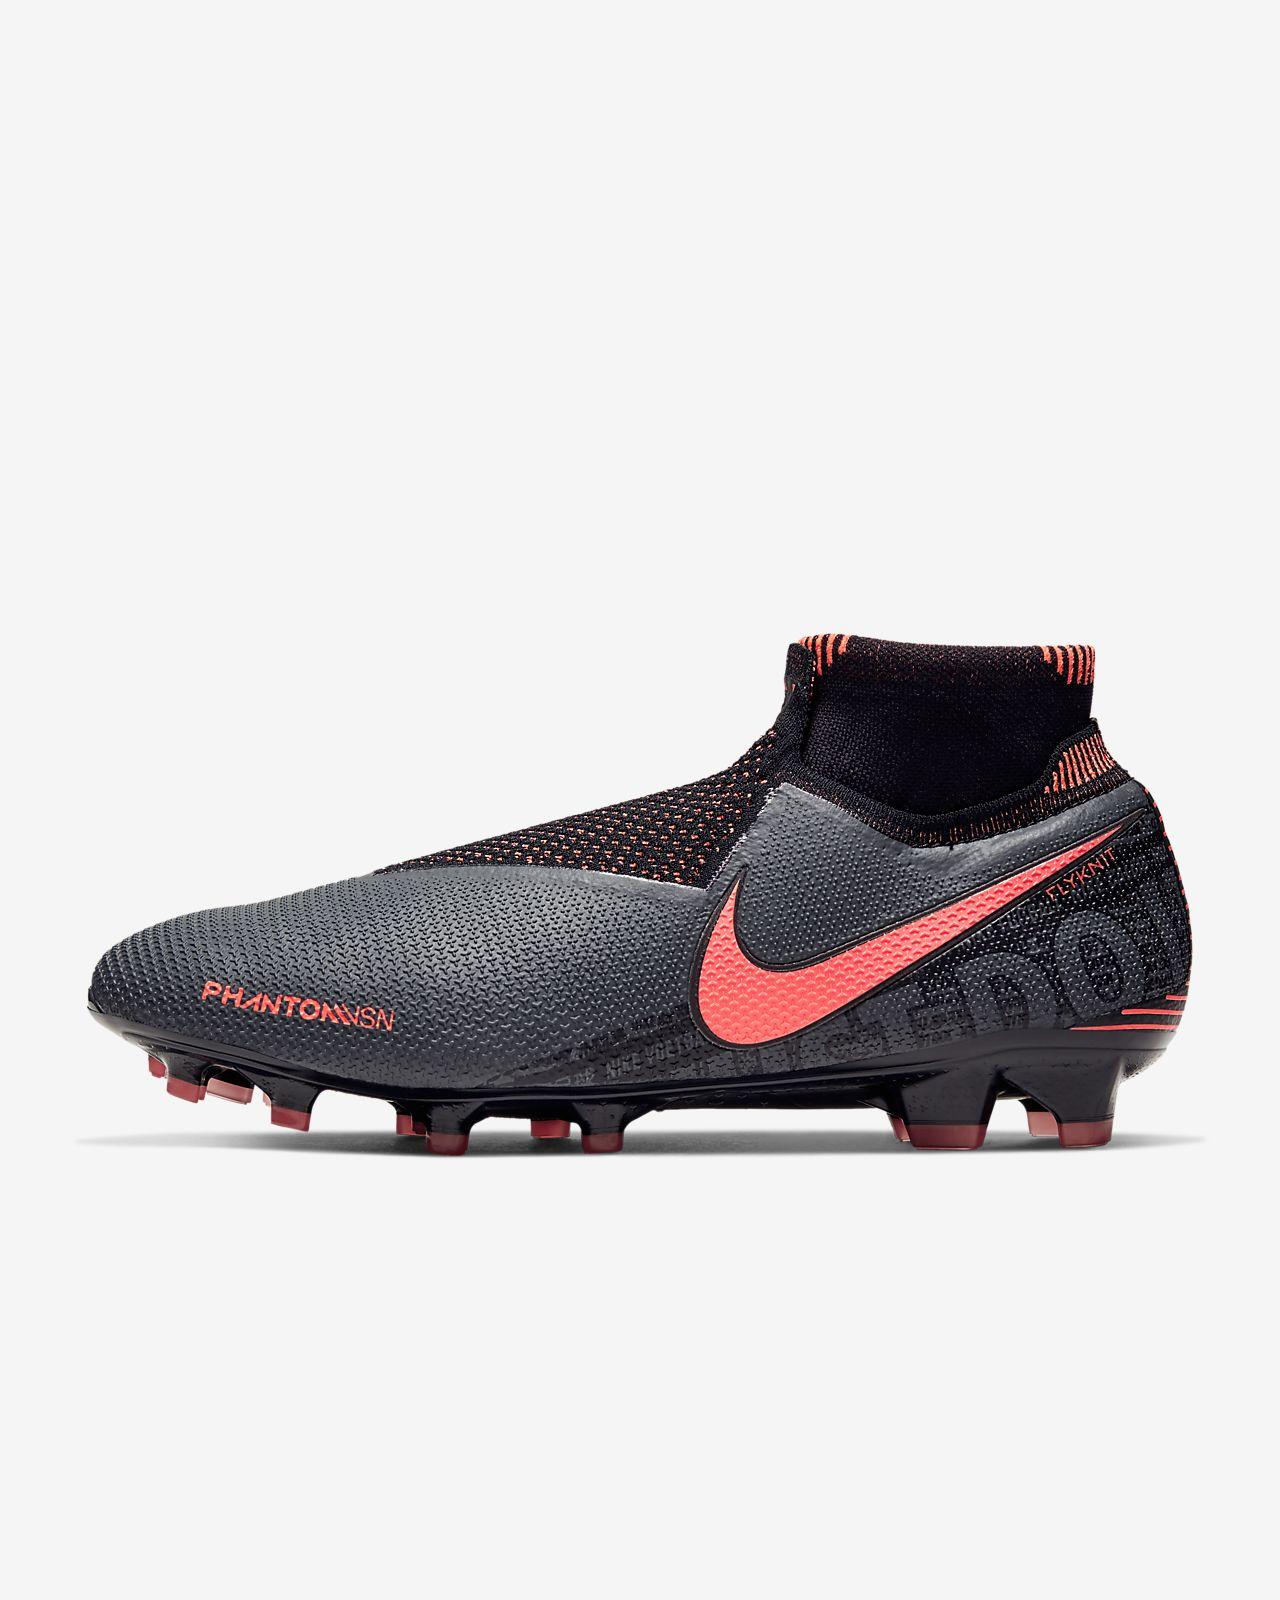 Chuteiras de futebol para terreno firme Nike Phantom Vision Elite Dynamic Fit FG